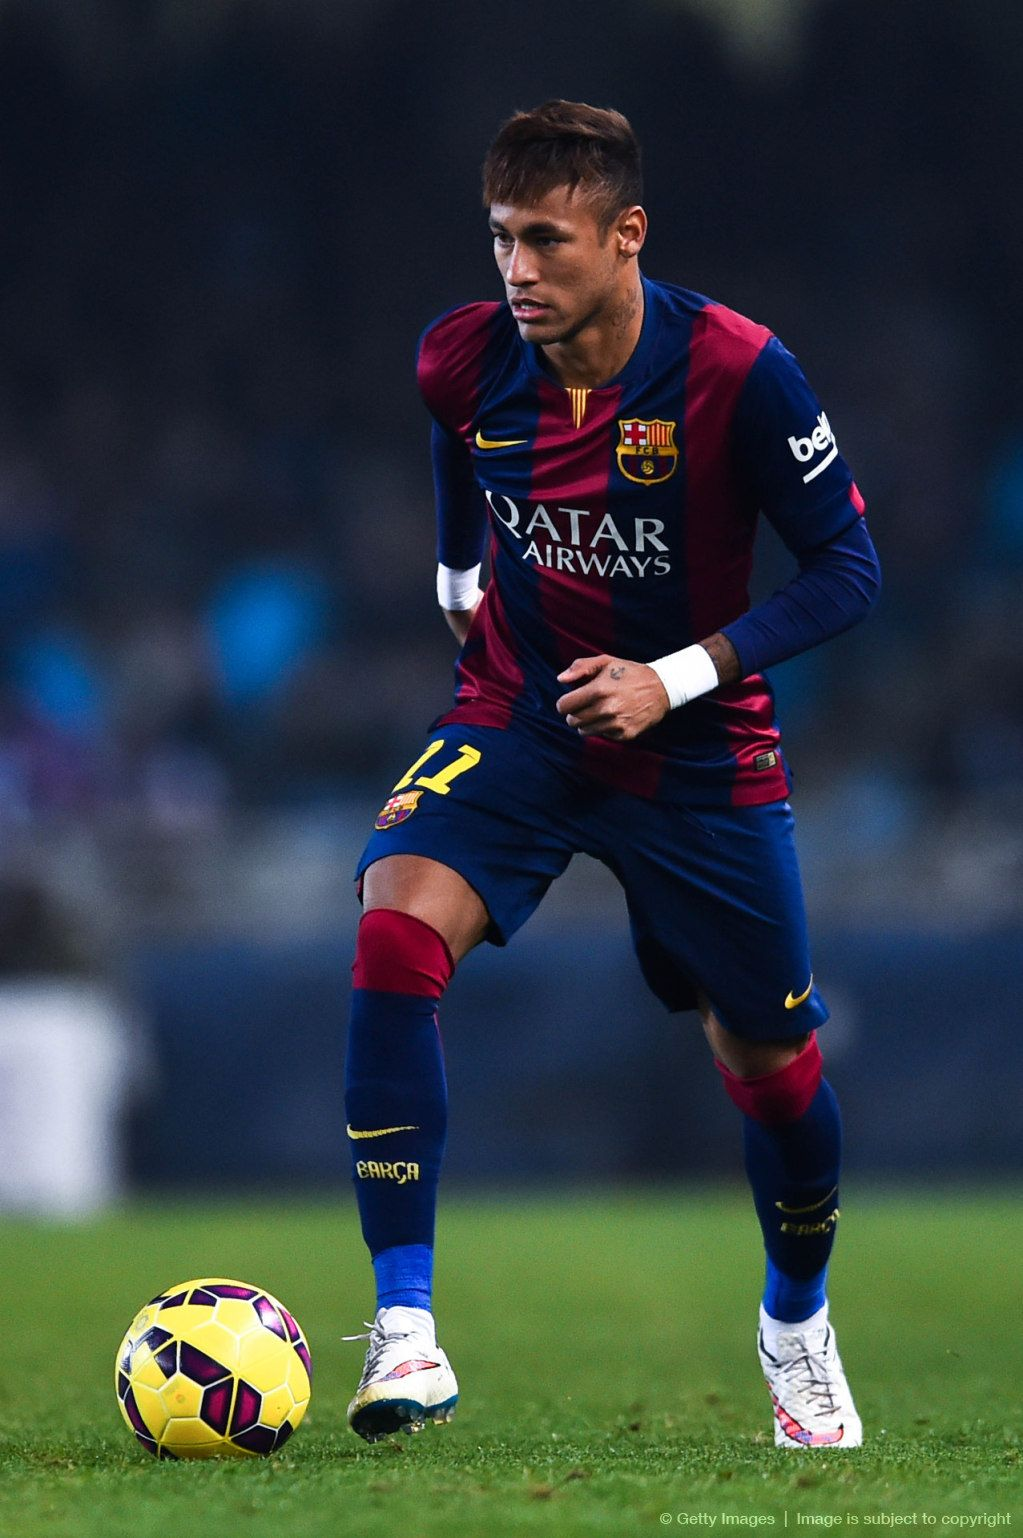 FC Barcelona / Neymar Jr | Neymar | Neymar, Neymar jr, Fc ...Neymar Playing Soccer 2014